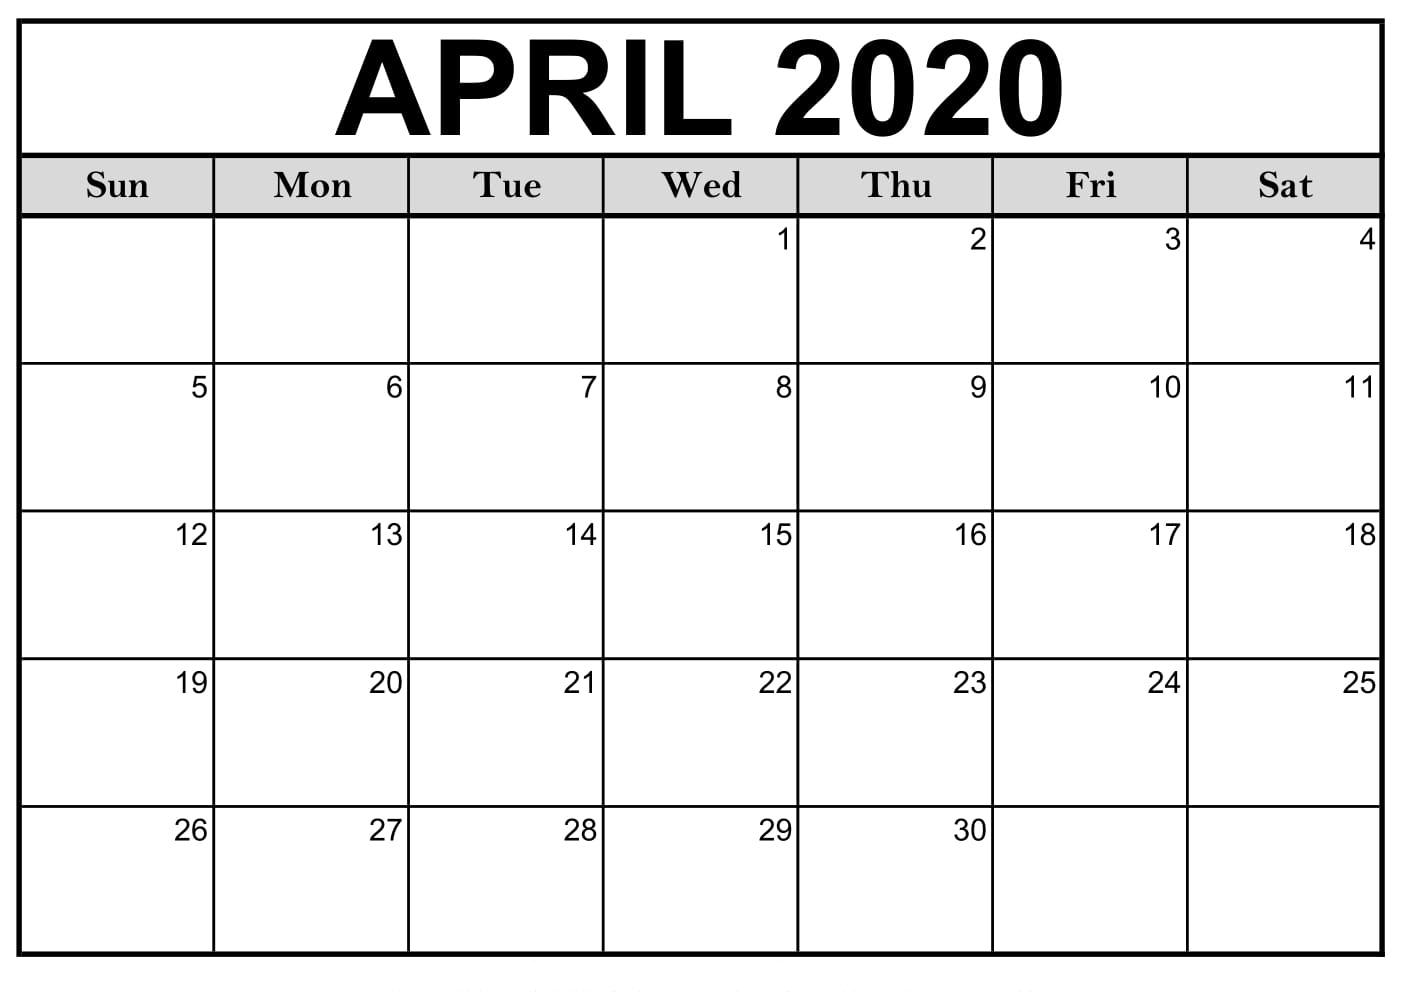 April 2020 Calendar Printable Monthly Calendar |idea